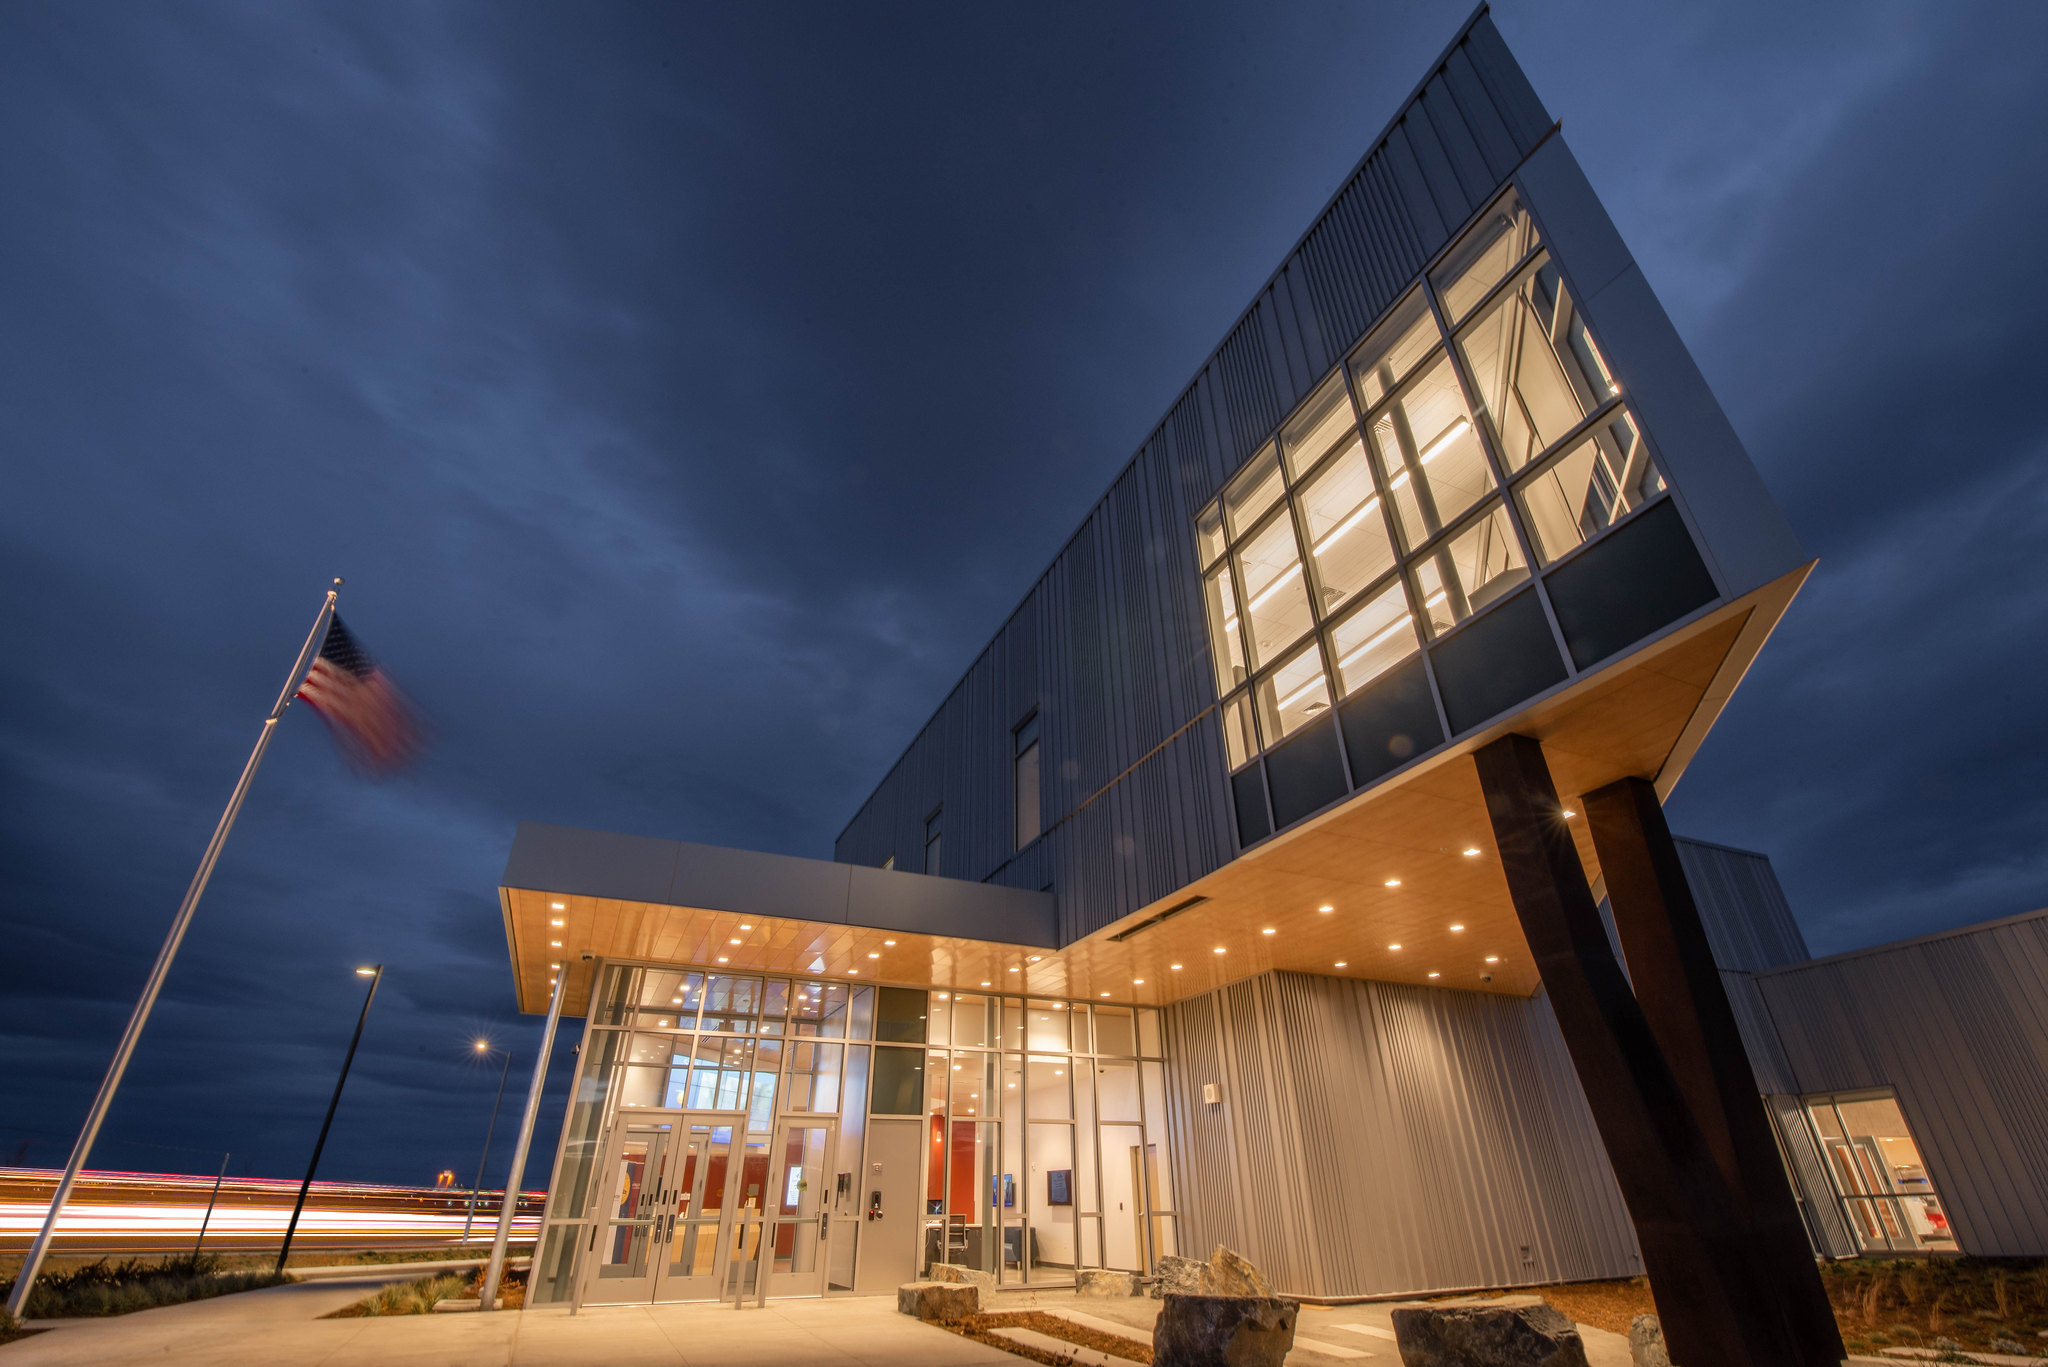 nighttime photo of Innovation Center Building